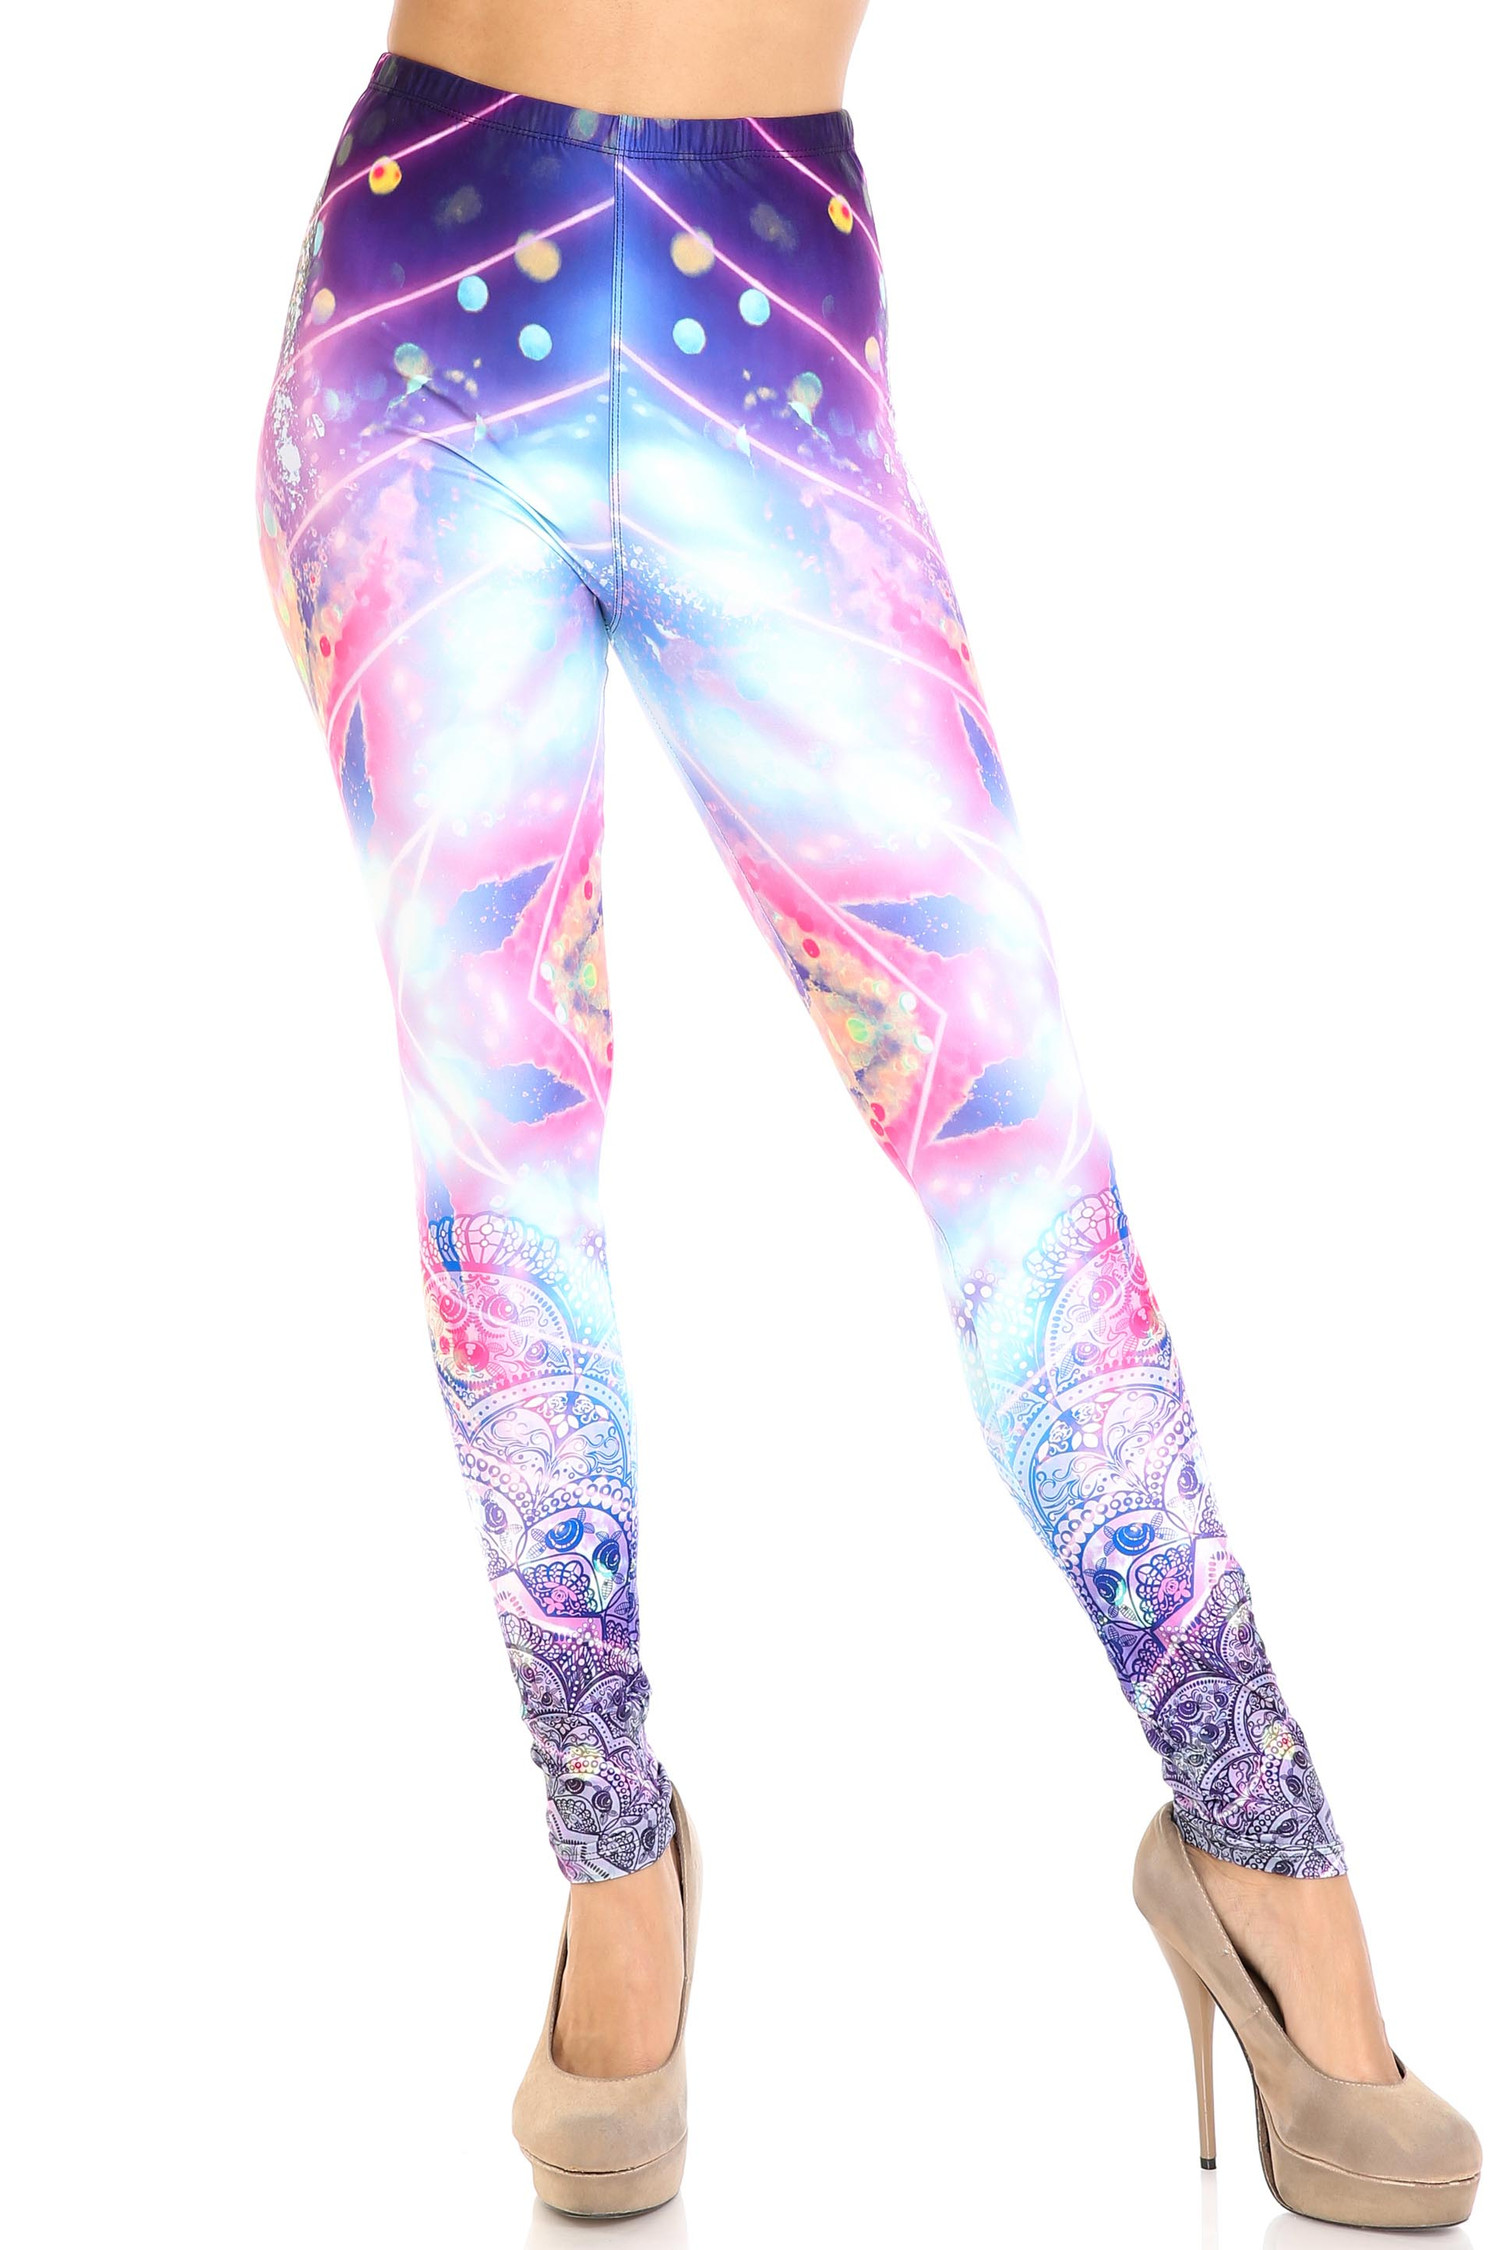 Creamy Soft Purple Mandala Lights Extra Plus Size Leggings - 3X-5X - By USA Fashion™